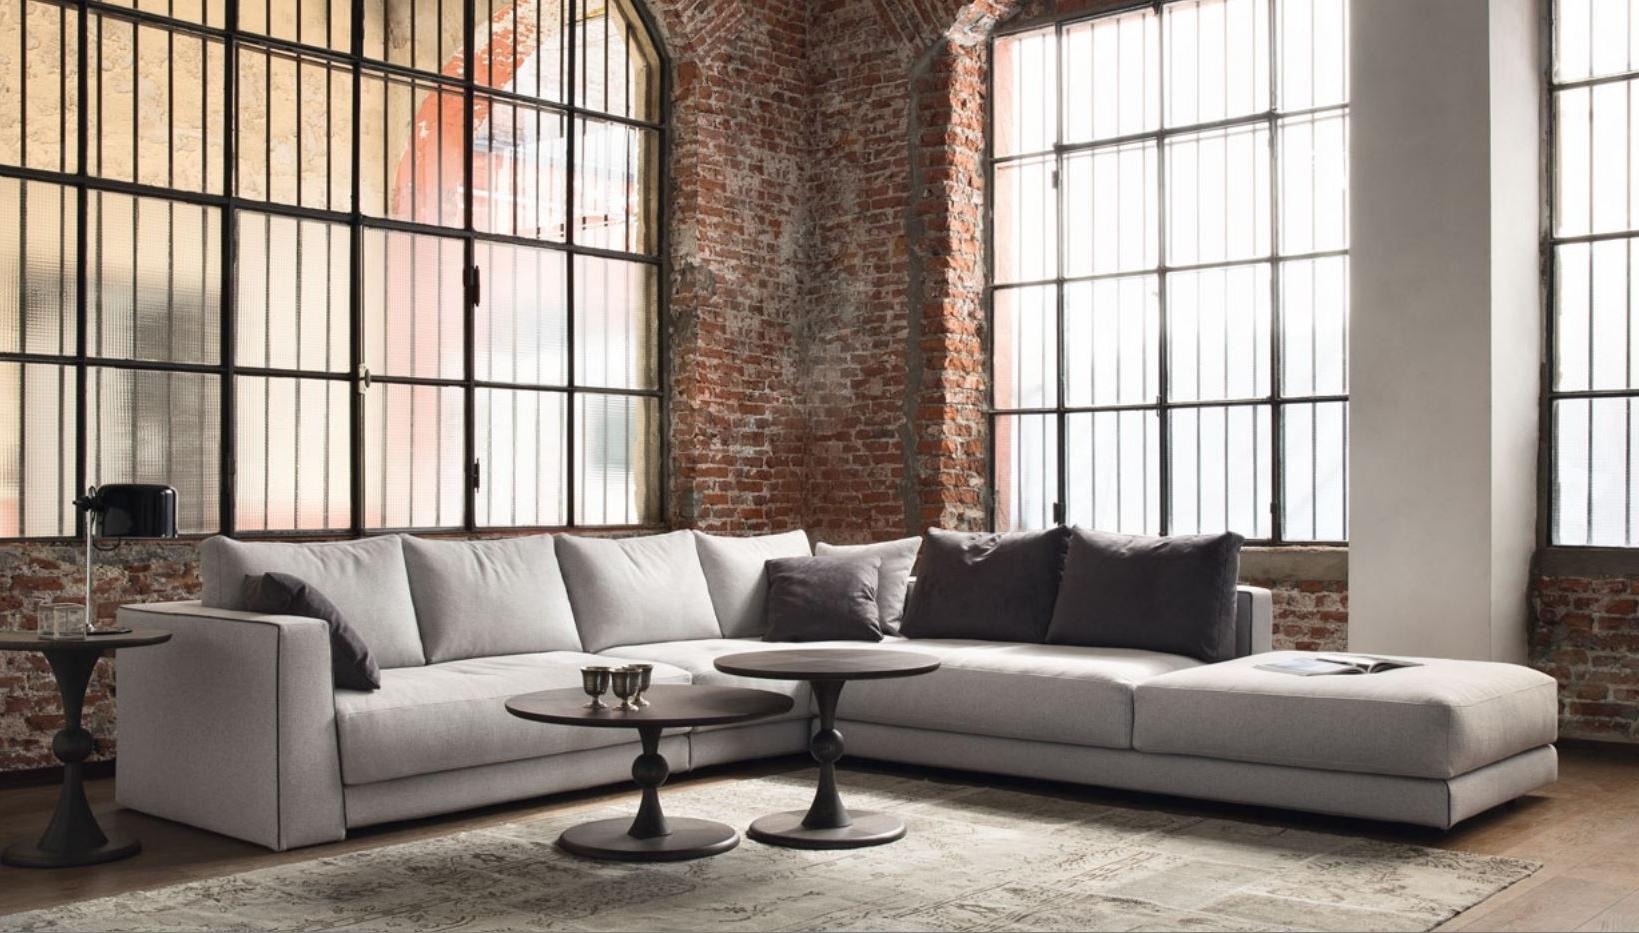 Most Popular Italian Sofas At Momentoitalia – Modern Sofas,designer Sofas With Long Modern Sofas (View 13 of 15)